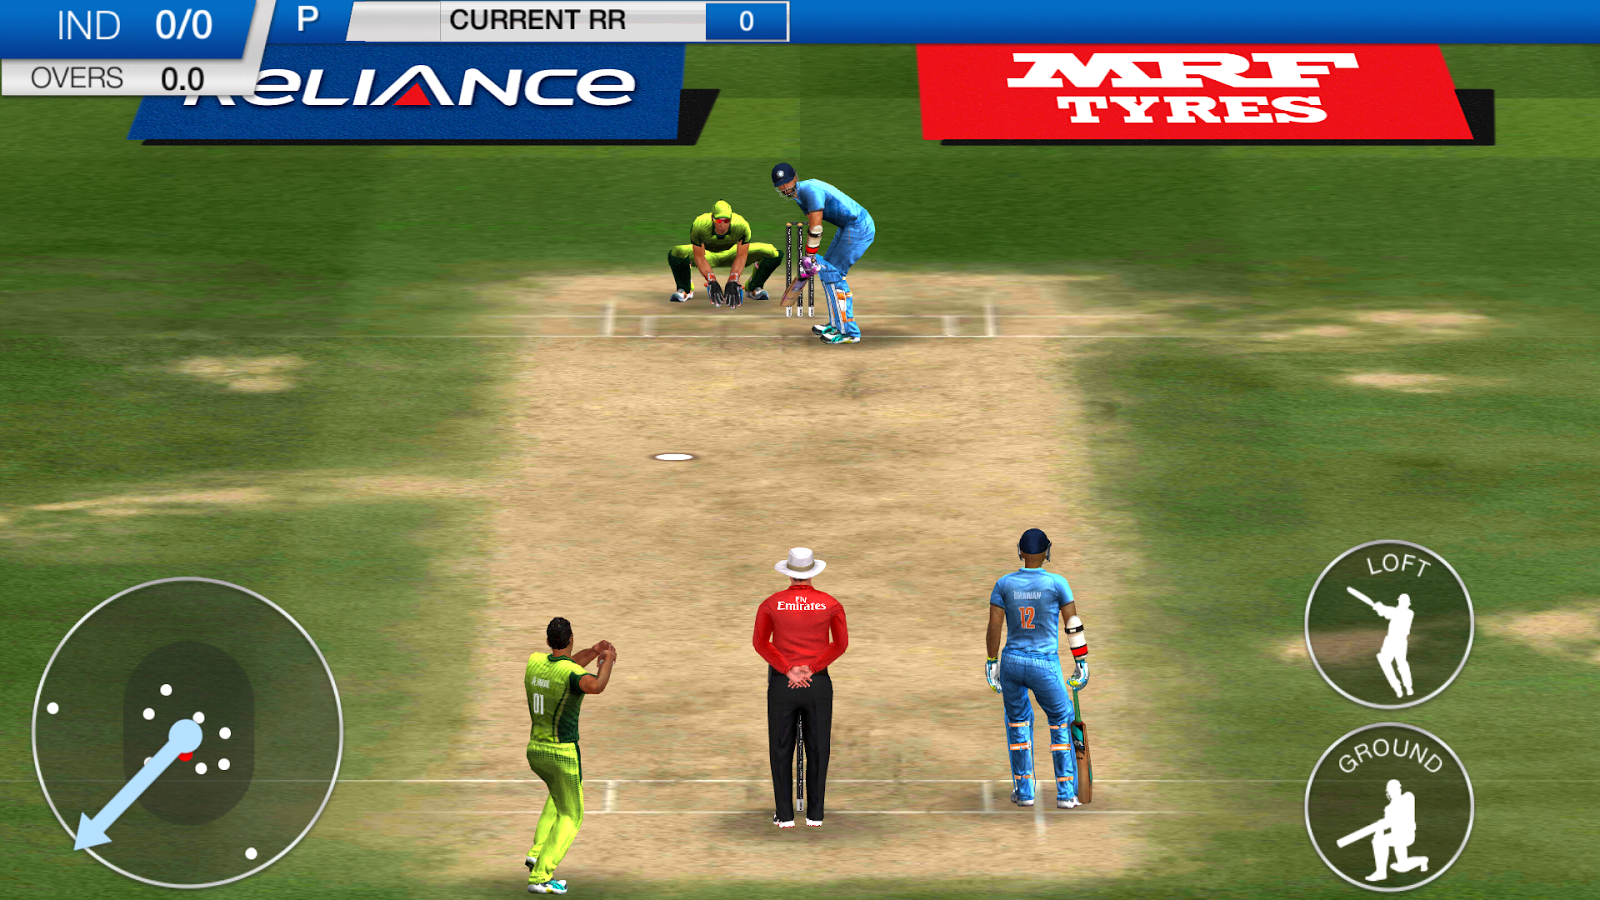 Icc pro cricket 2015 screenshot